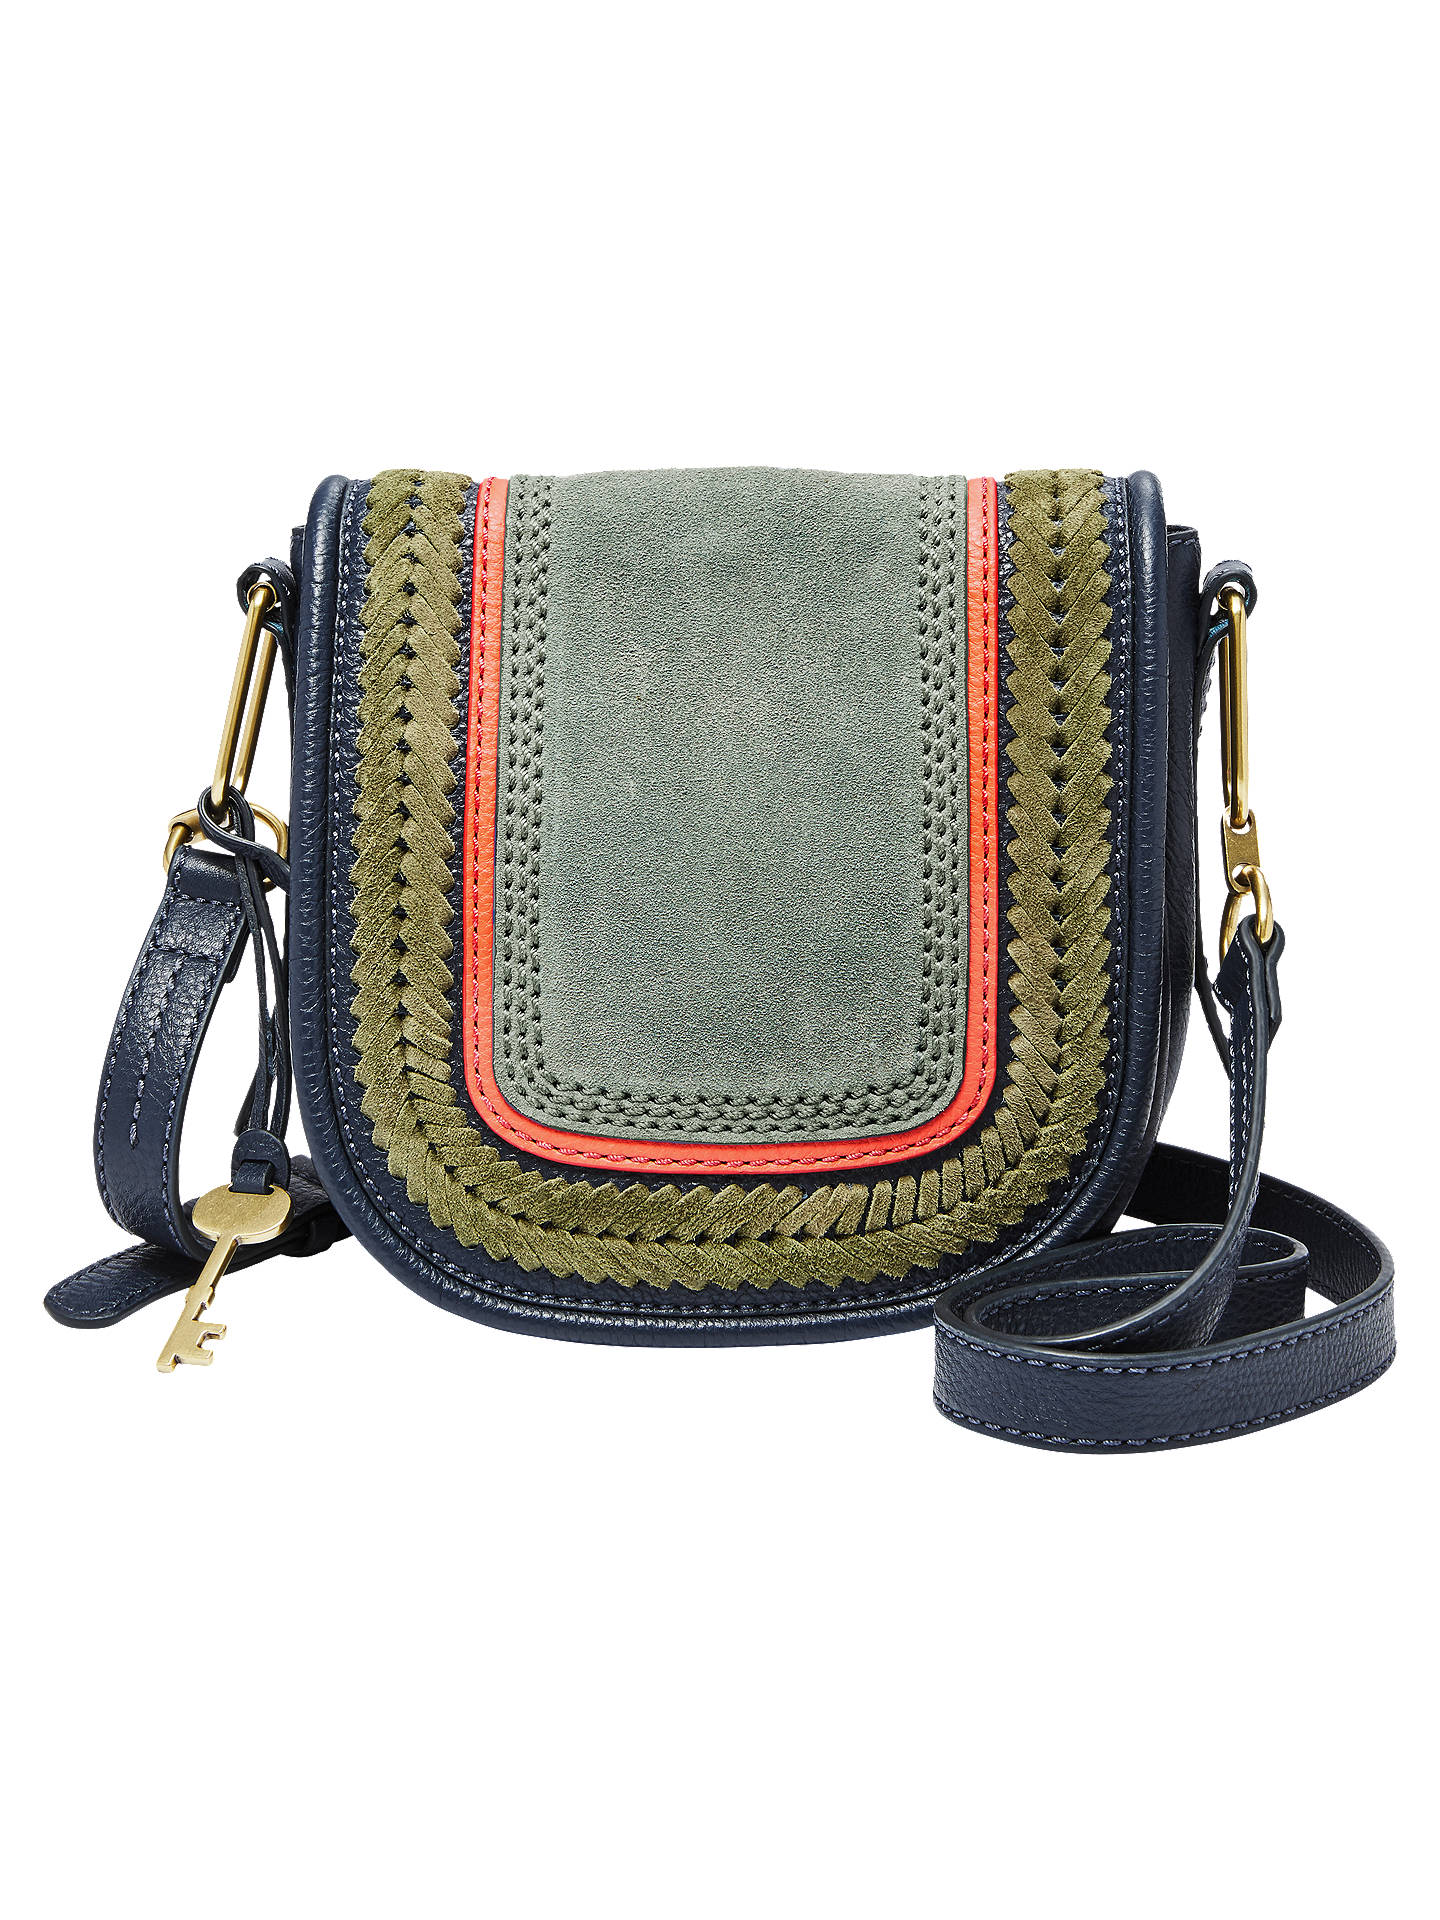 f570b4cb670d Buy Fossil Rumi Small Leather Cross Body Bag